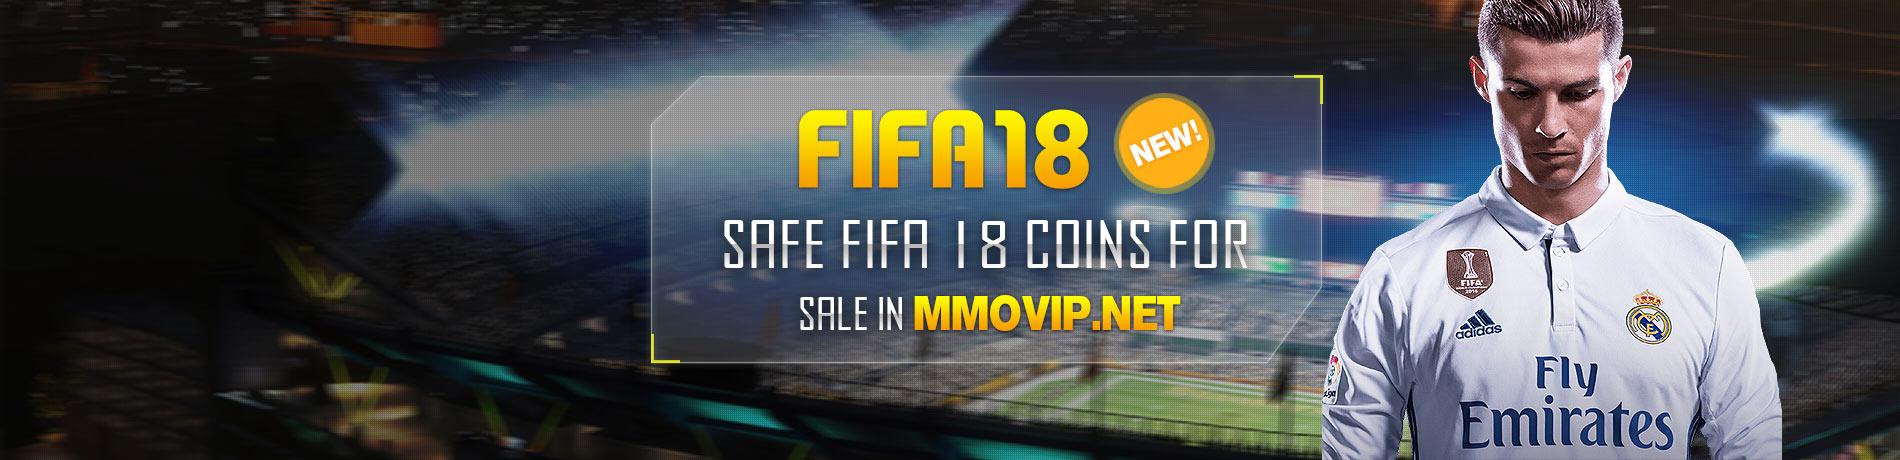 Buy FIFA 18 Coins